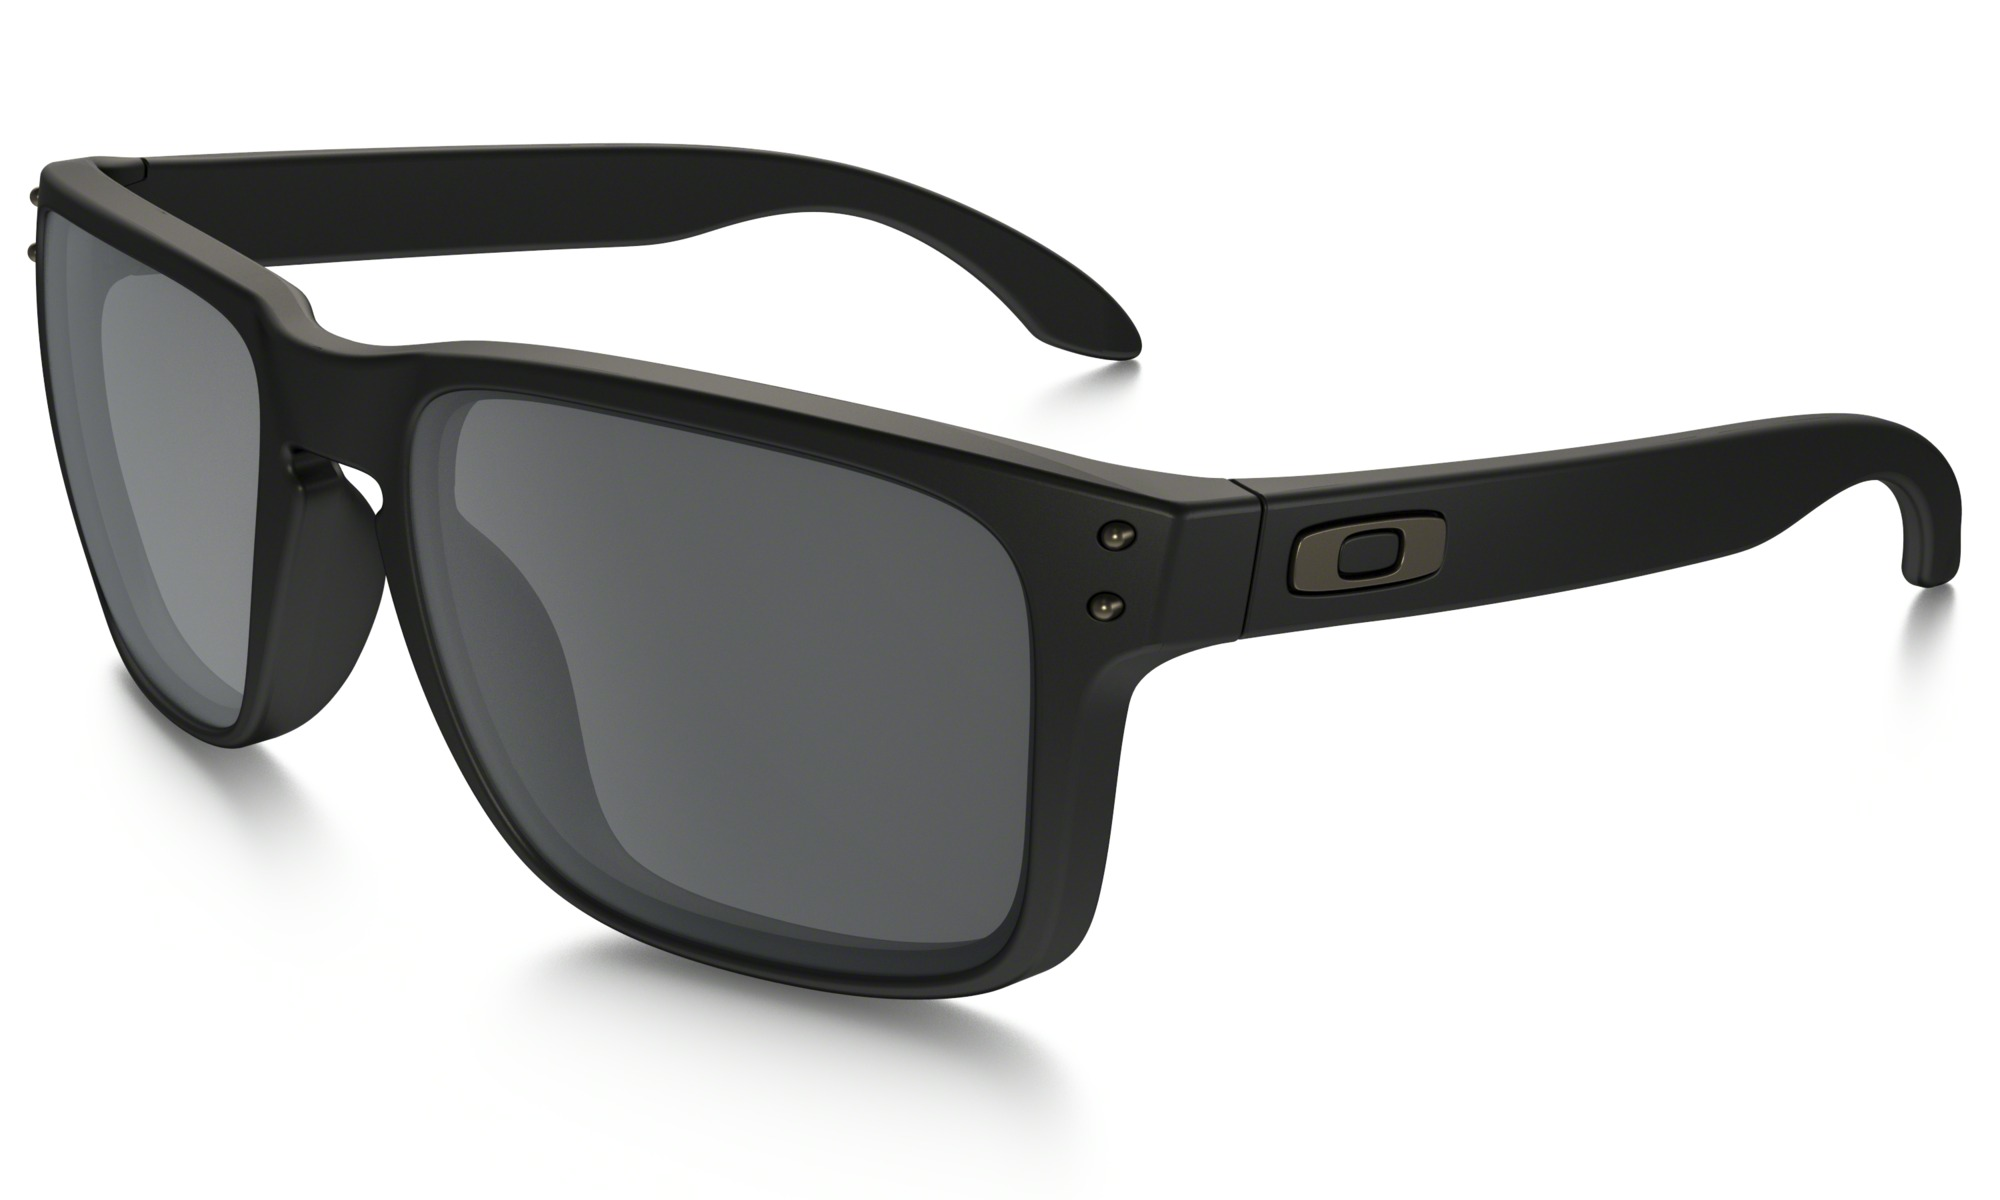 oakley sunglasses easton town center  oakley holbrook matte black black iridium front